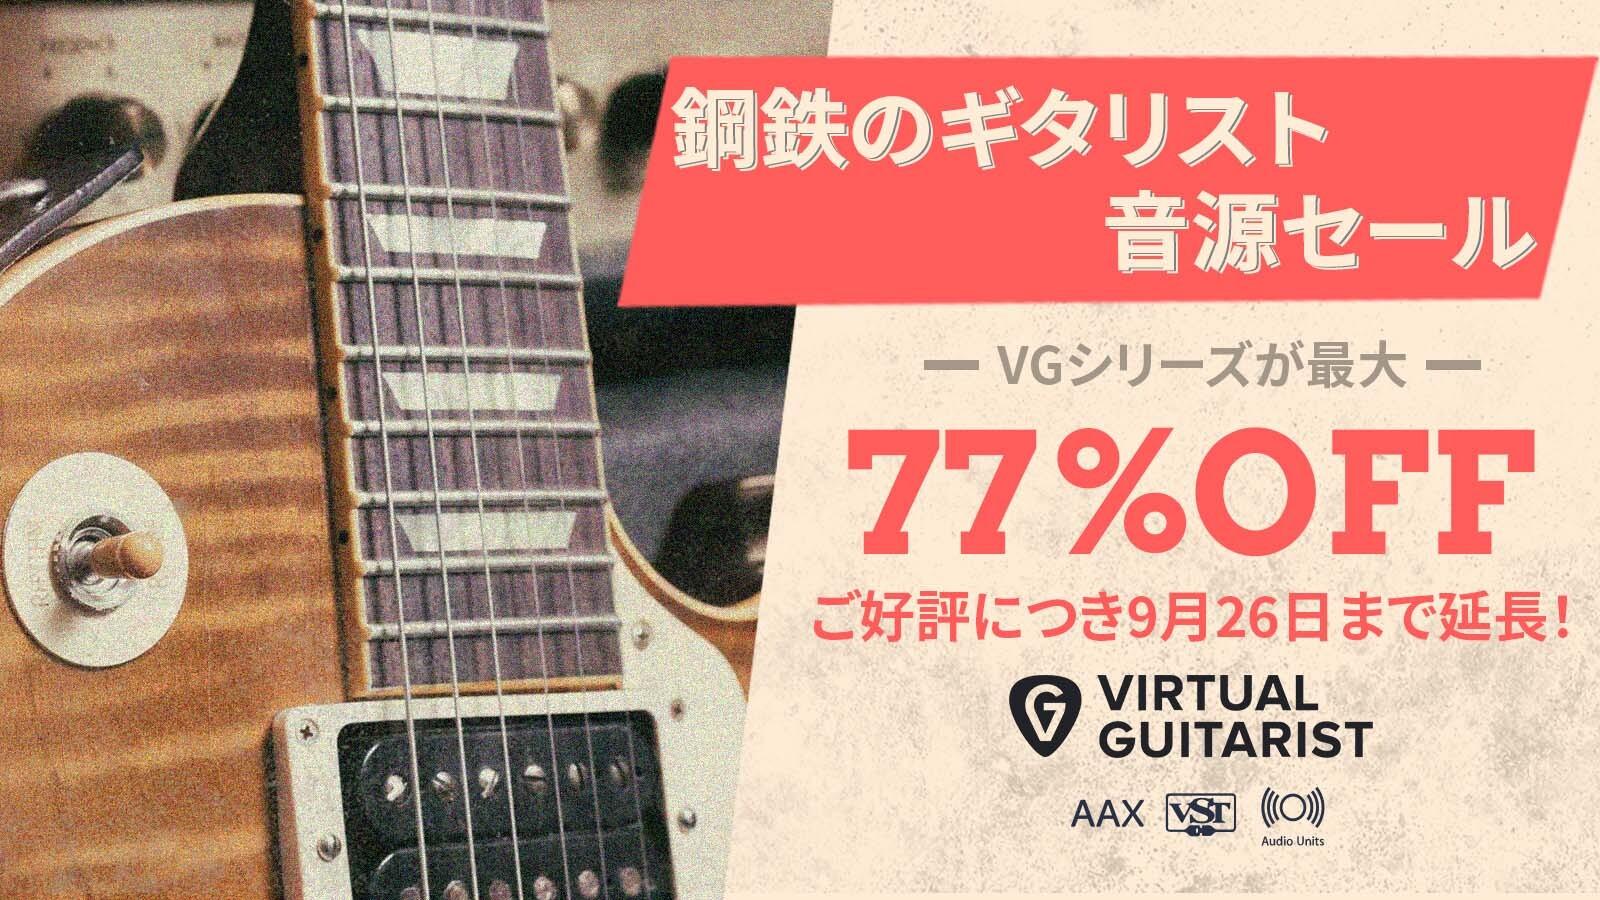 UJAM 鋼鉄のギタリスト音源セール!  9月26日まで延長決定!